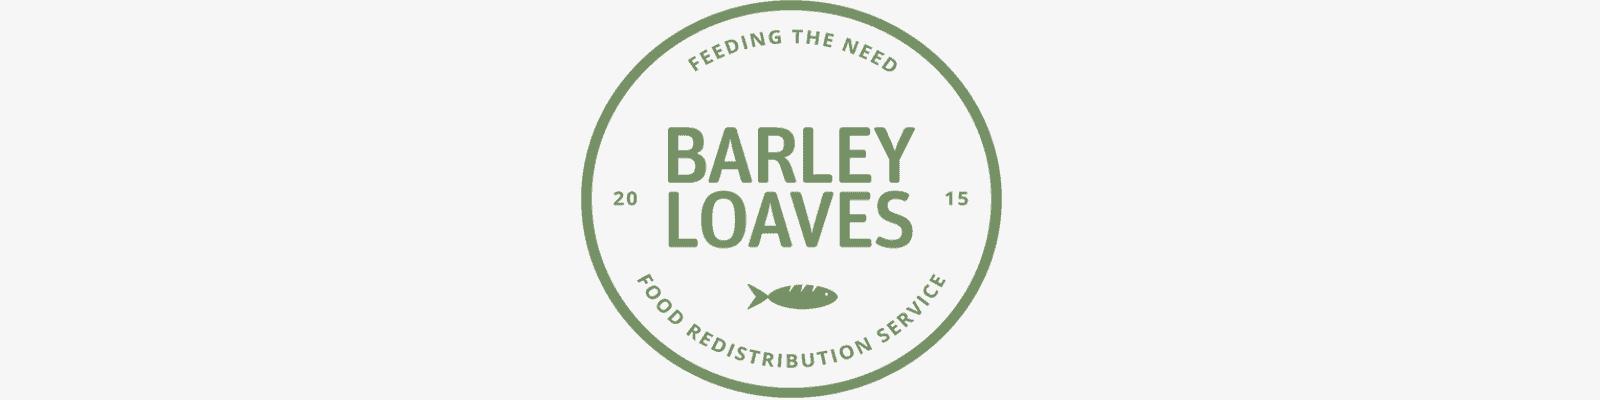 barley-loaves-banner-1